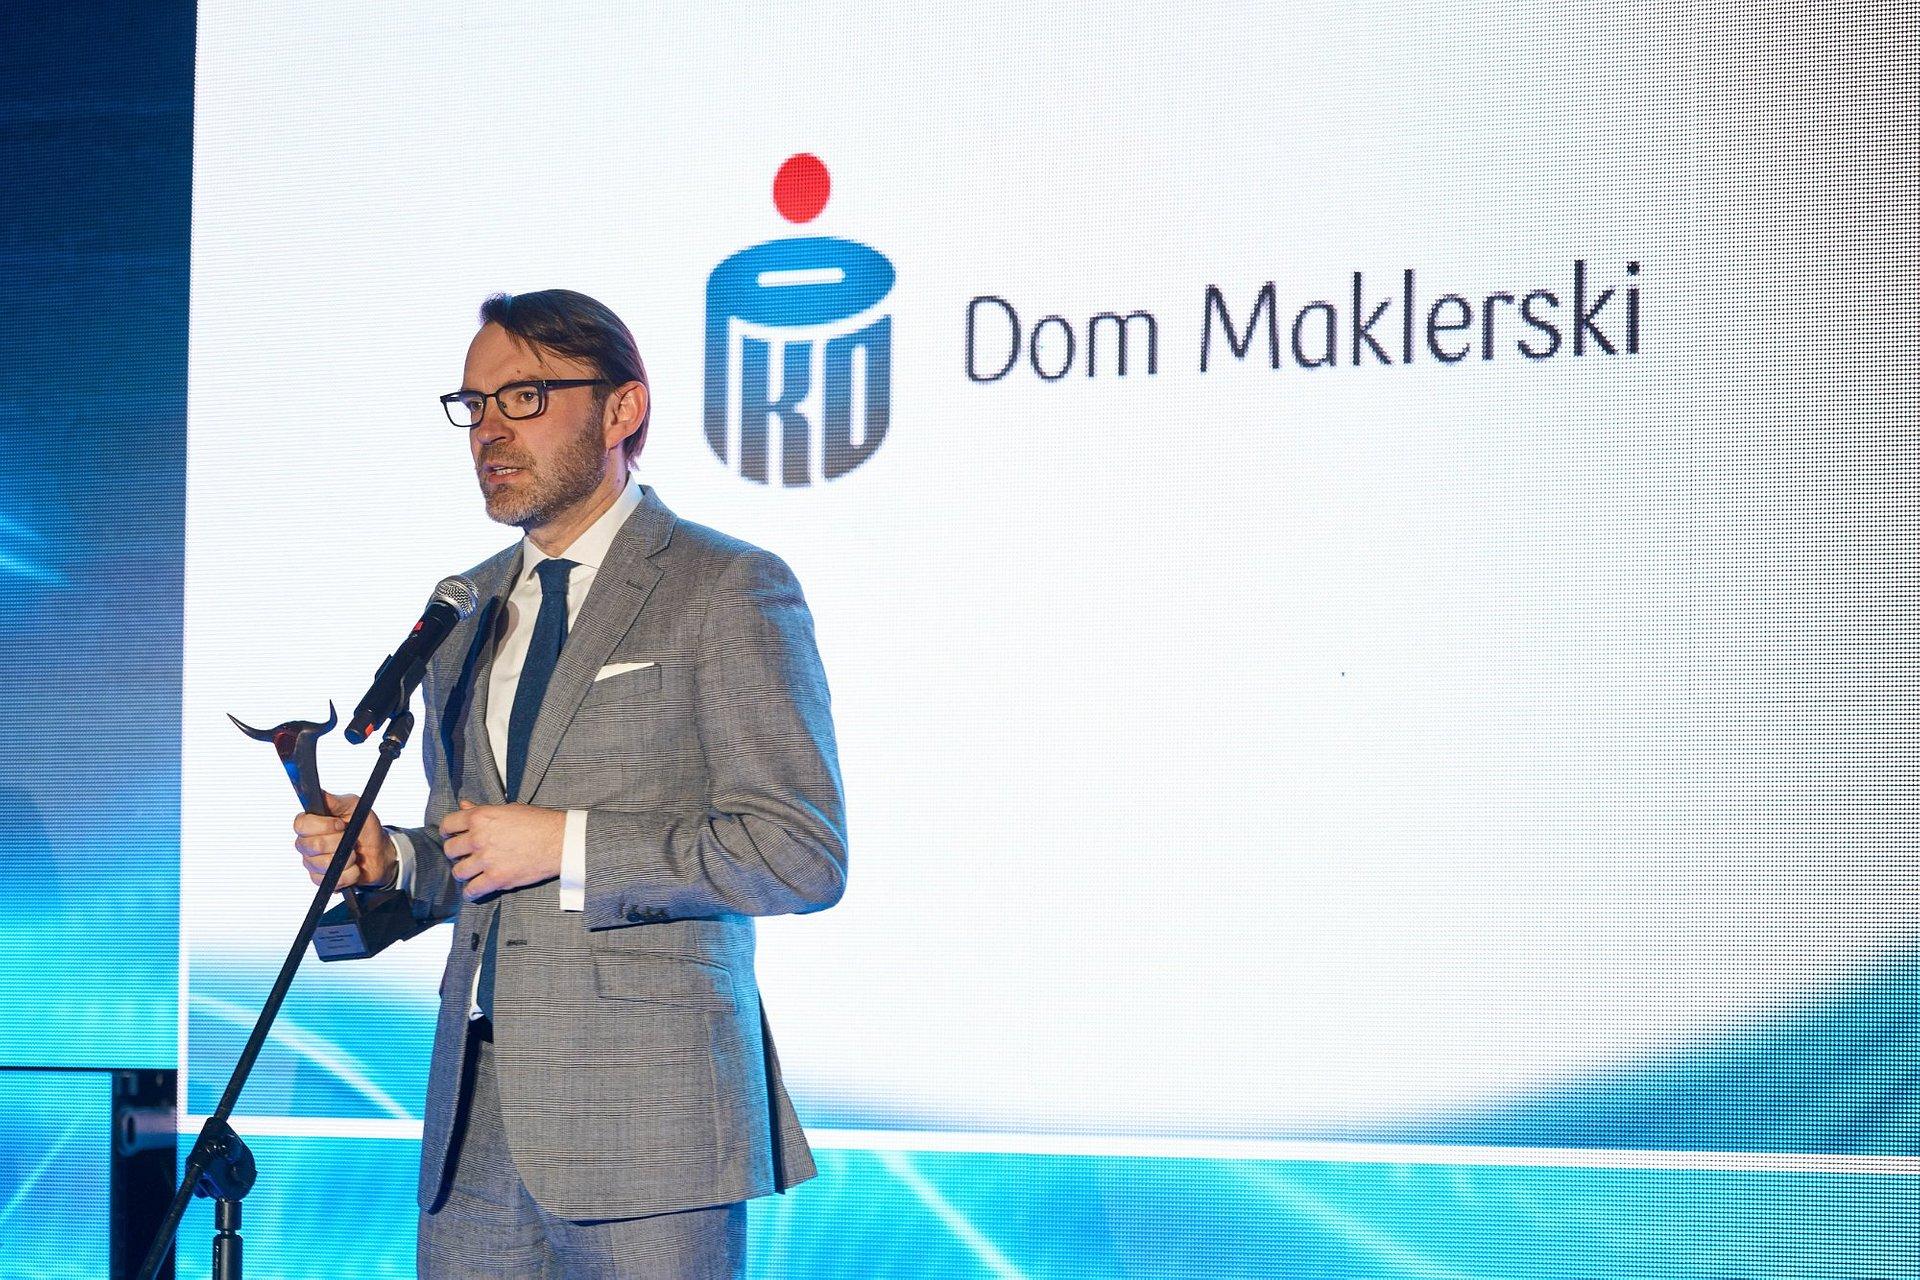 Dom Maklerski PKO Banku Polskiego Brokerem Roku 2018